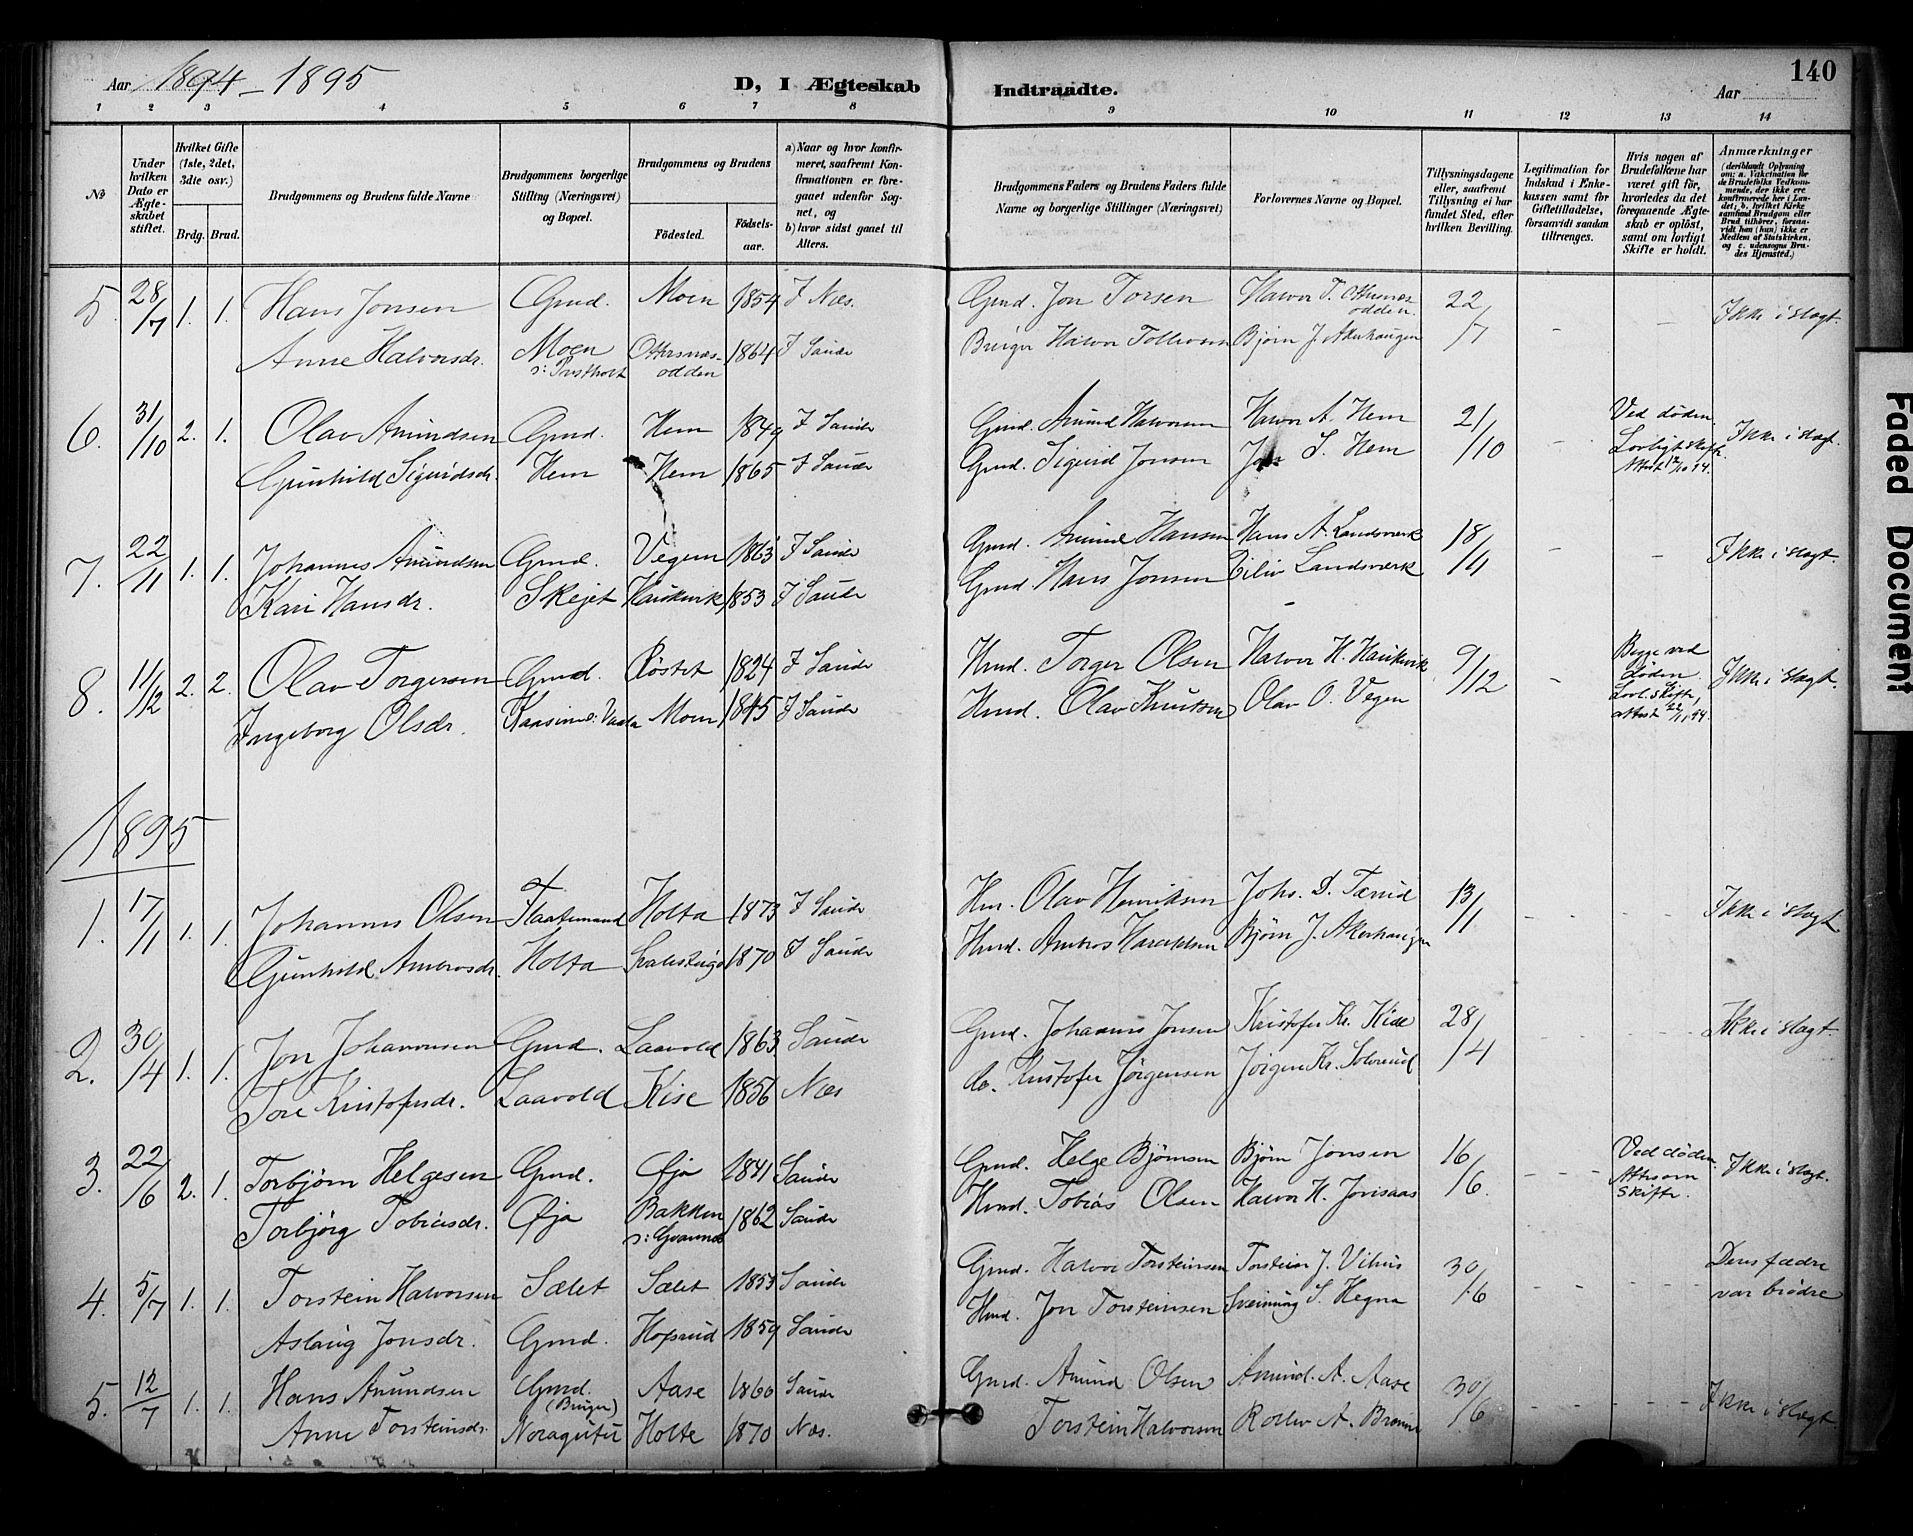 SAKO, Sauherad kirkebøker, F/Fa/L0009: Ministerialbok nr. I 9, 1887-1912, s. 140